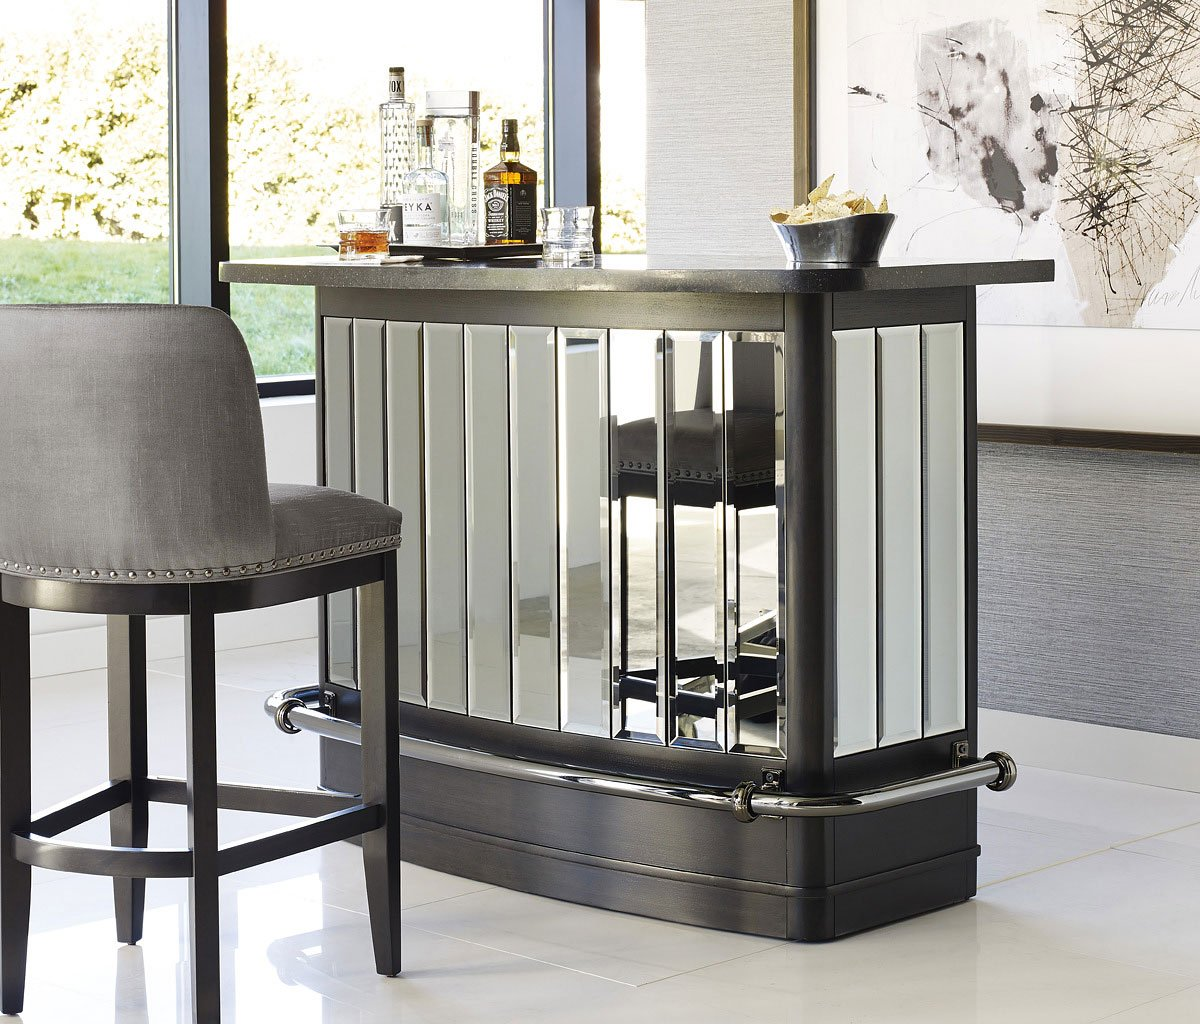 Bar Set For Home: Silverton Sound Home Bar Set Pulaski Furniture